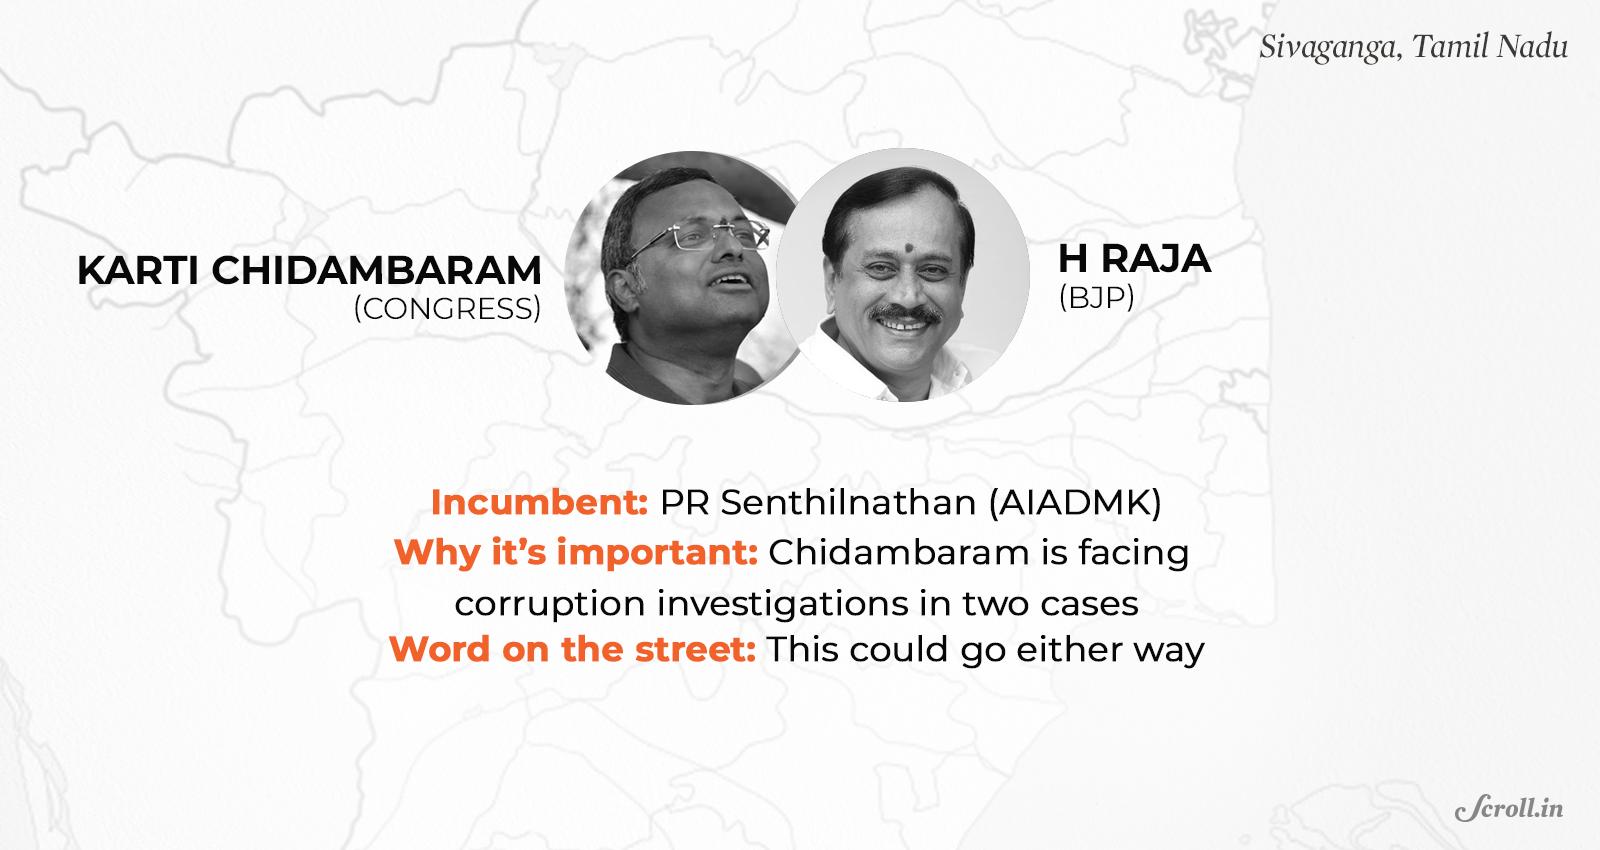 Sivaganga 2019 election: Karti Chidambaram faces tough fight